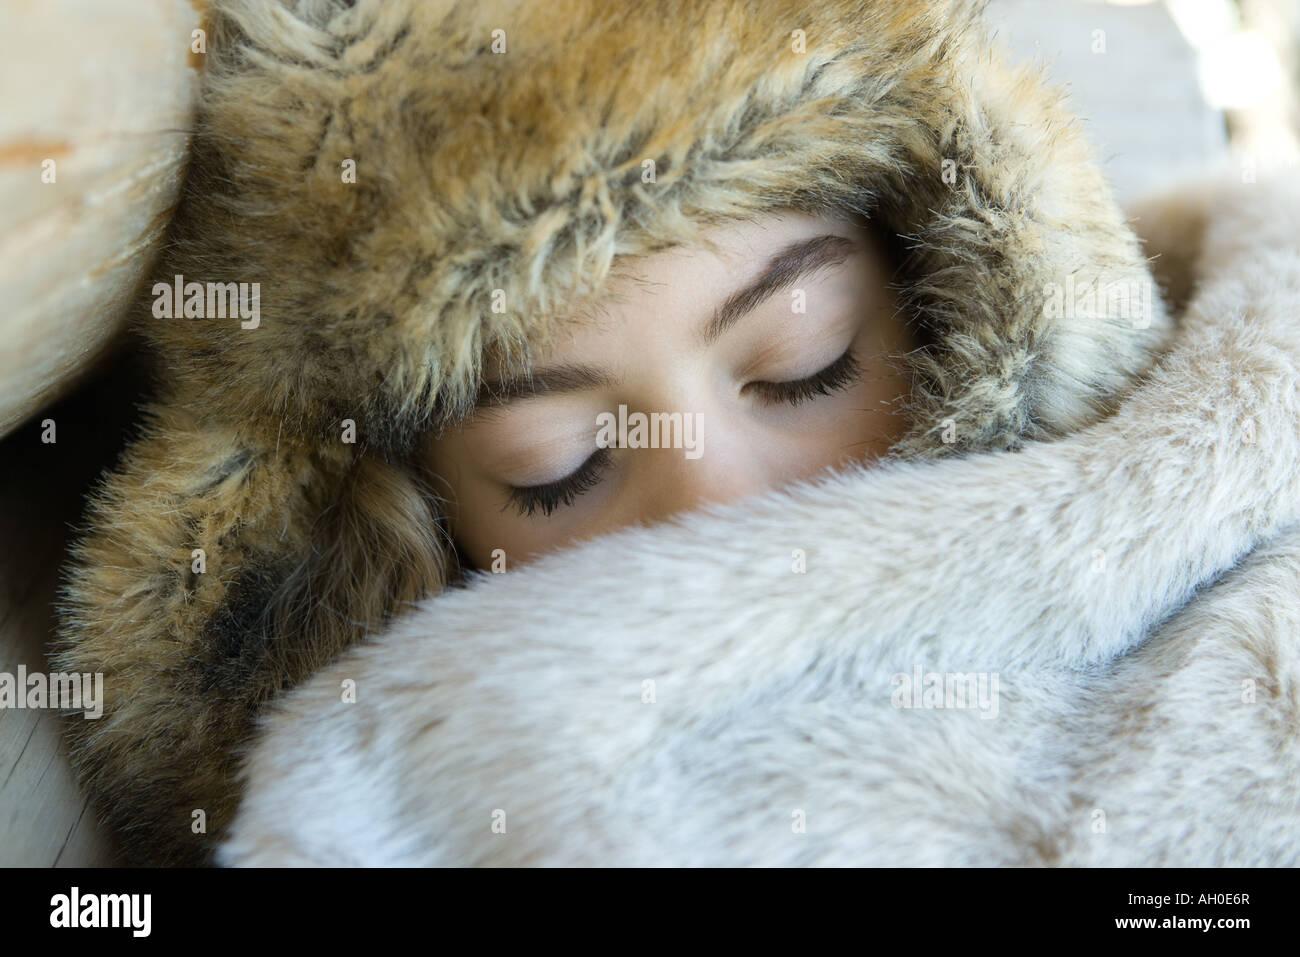 Furry Hat Immagini   Furry Hat Fotos Stock - Alamy f73a7c0bf356